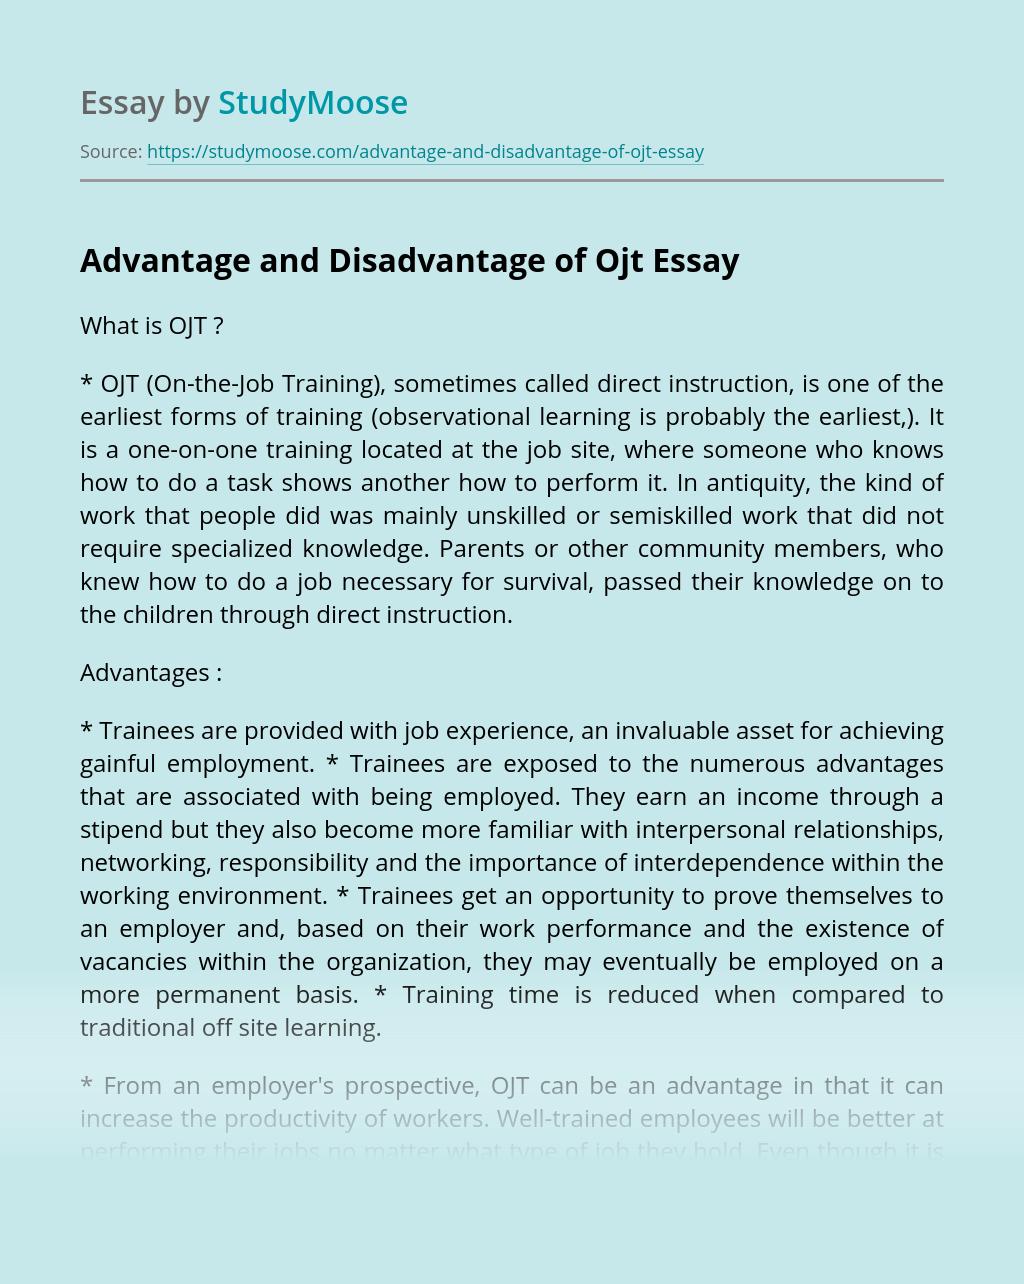 Advantage and Disadvantage of Ojt